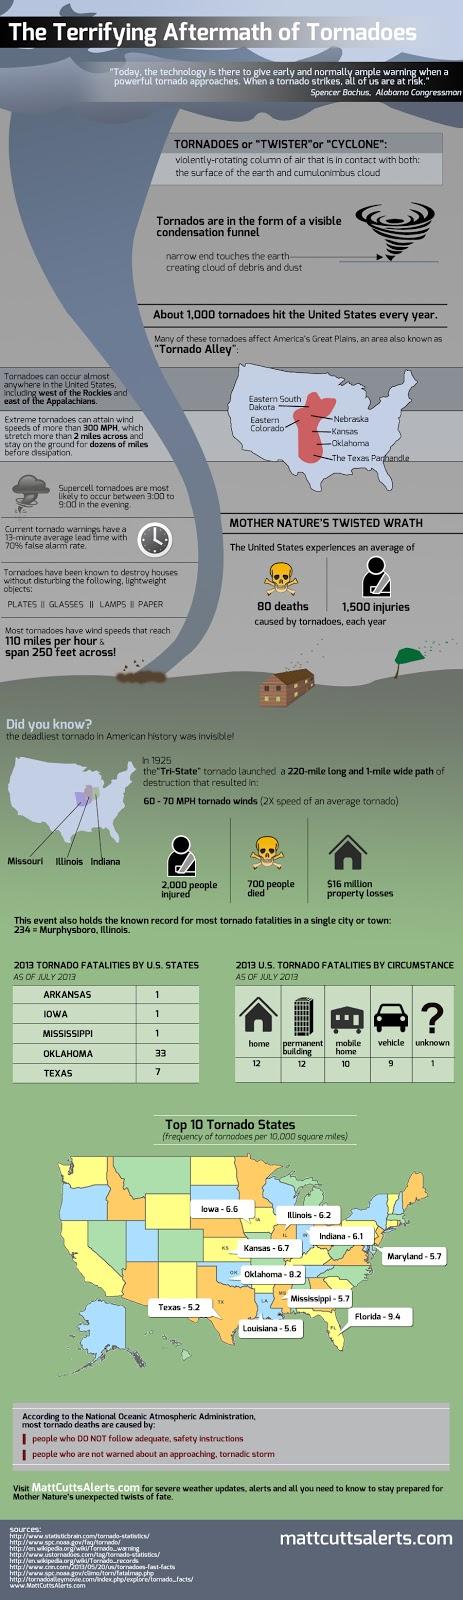 Tornado statistics infographic